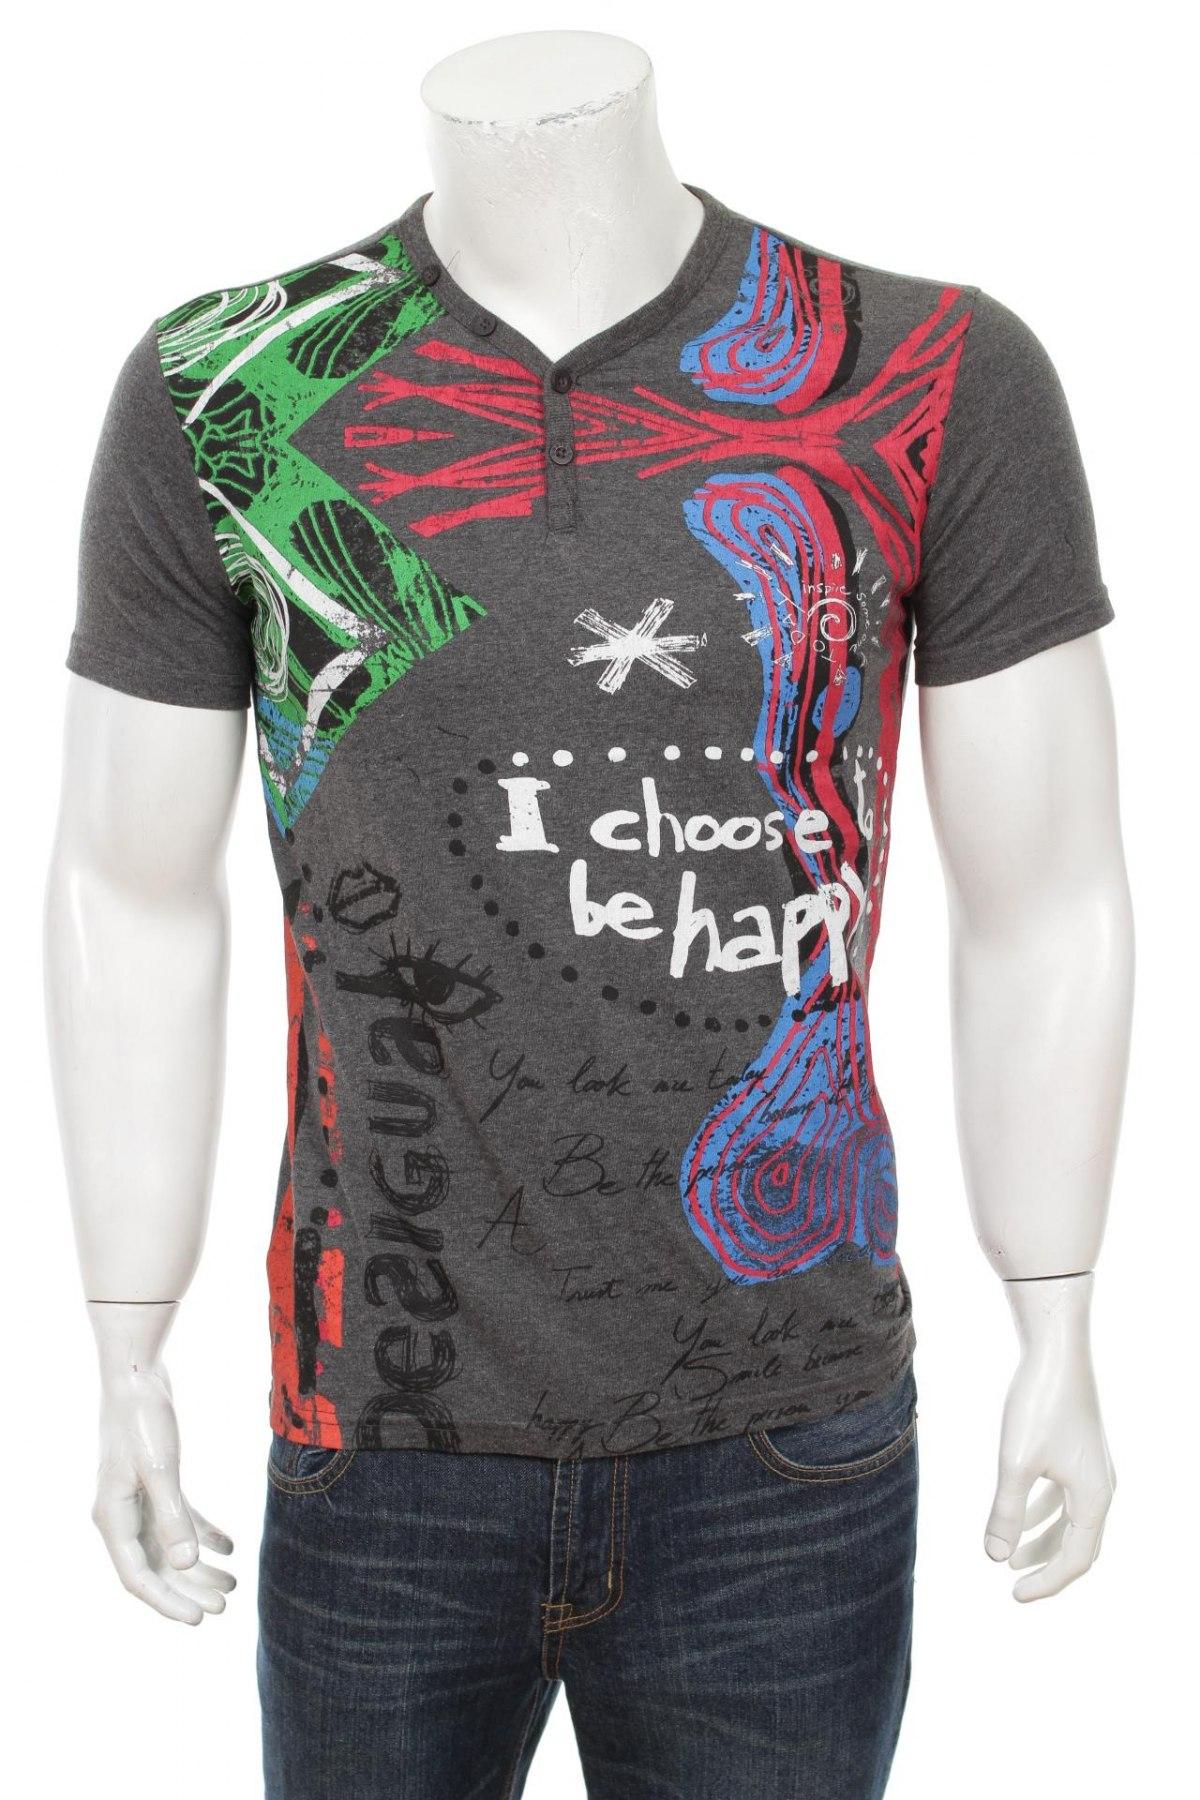 Pánske tričko Desigual - za výhodnú cenu na Remix -  102385606 4d3c8dfa1c6